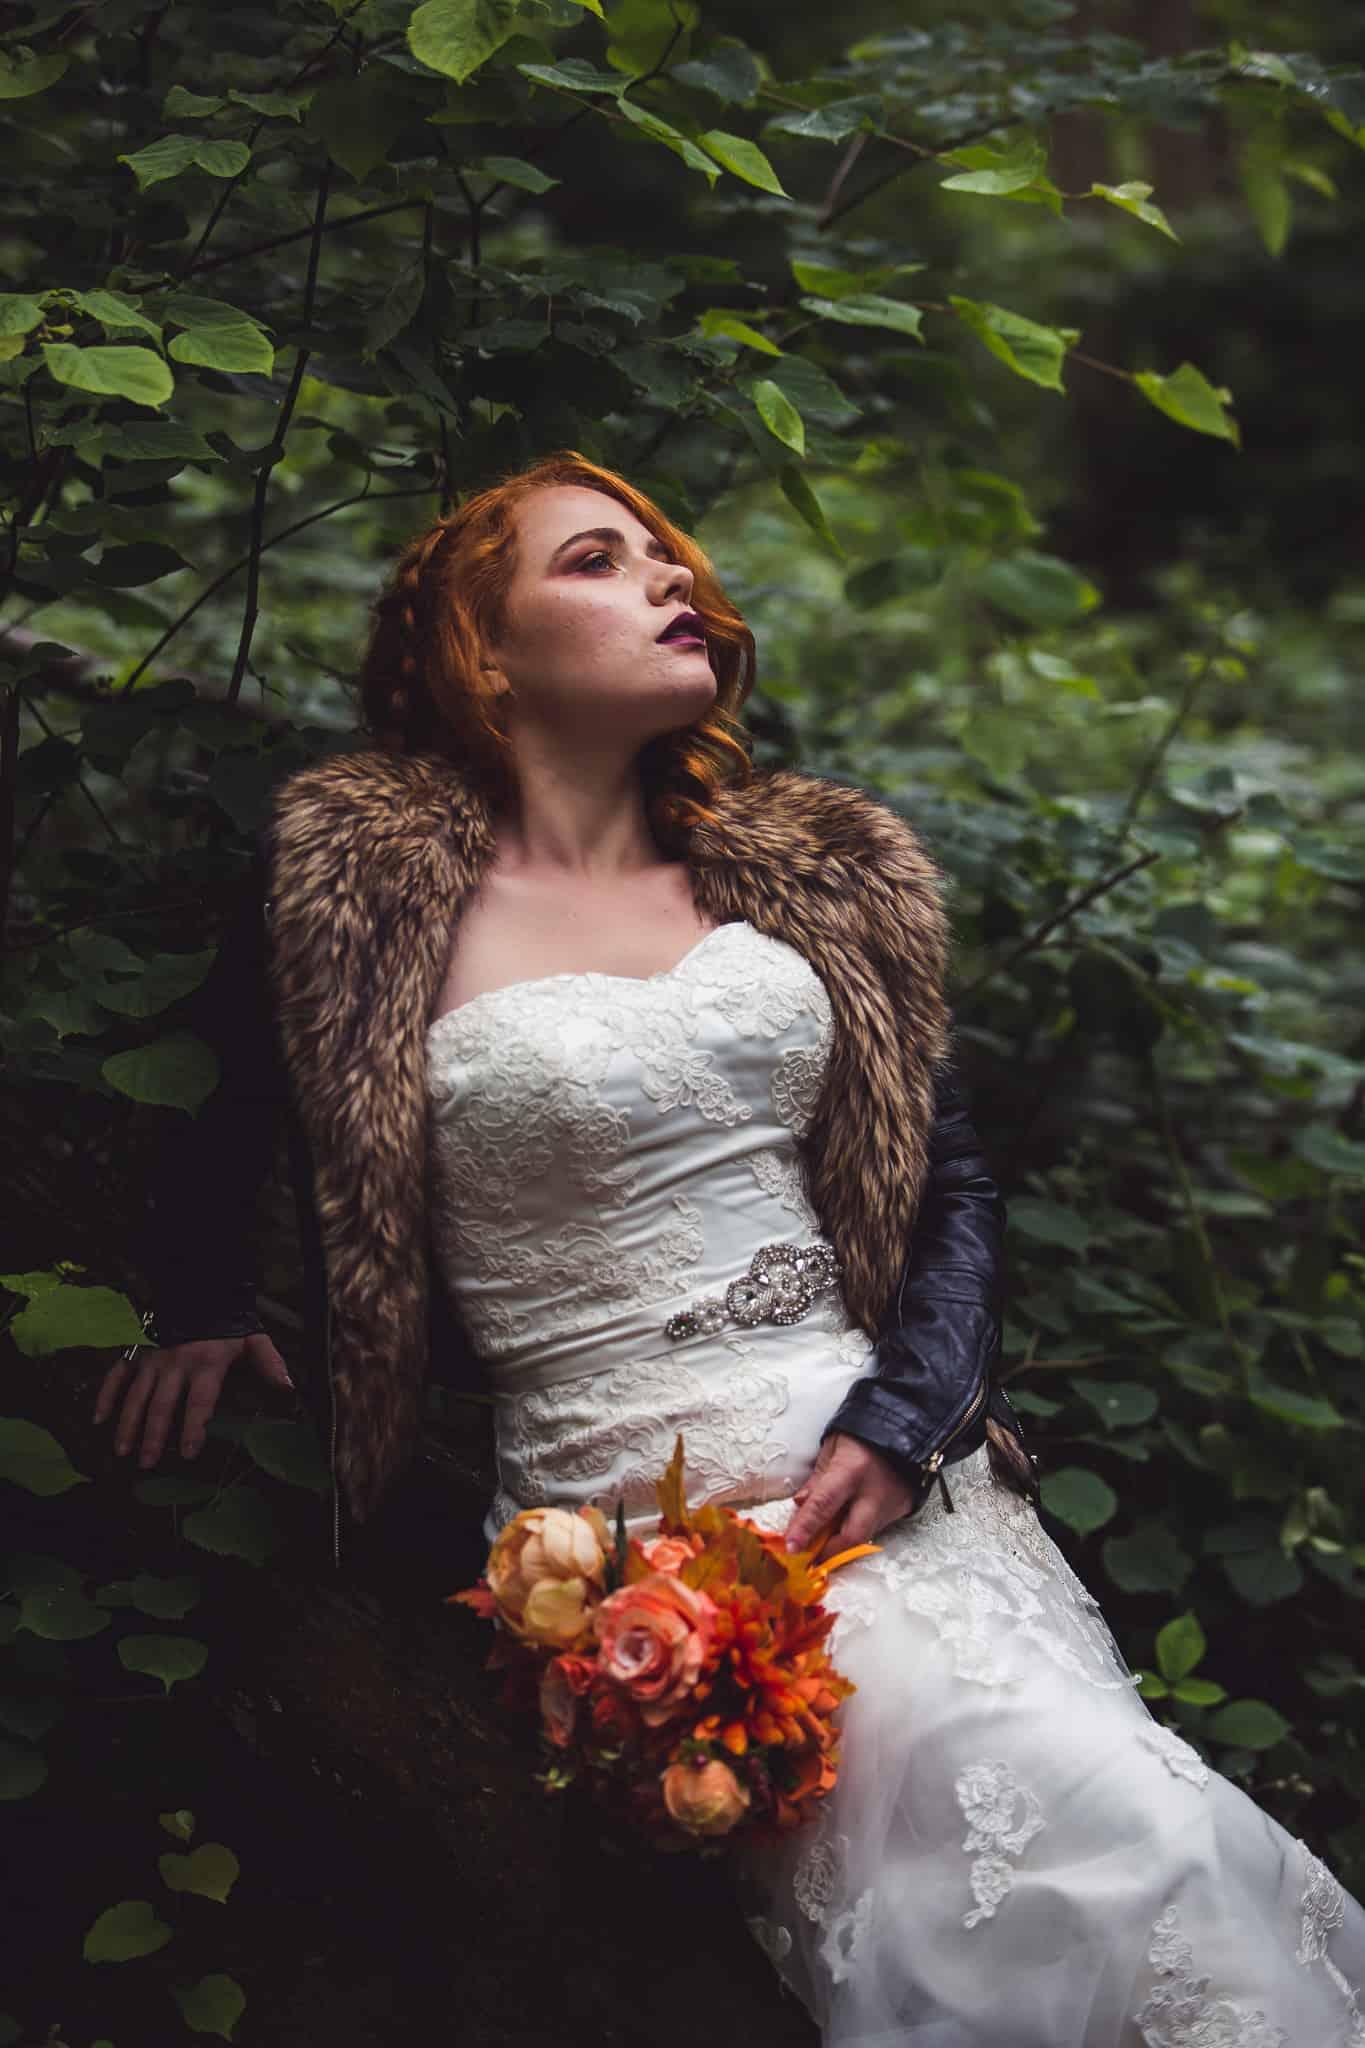 outdoor wedding bride rock chick leather jacket autumnal orange photography Katie Mortimore